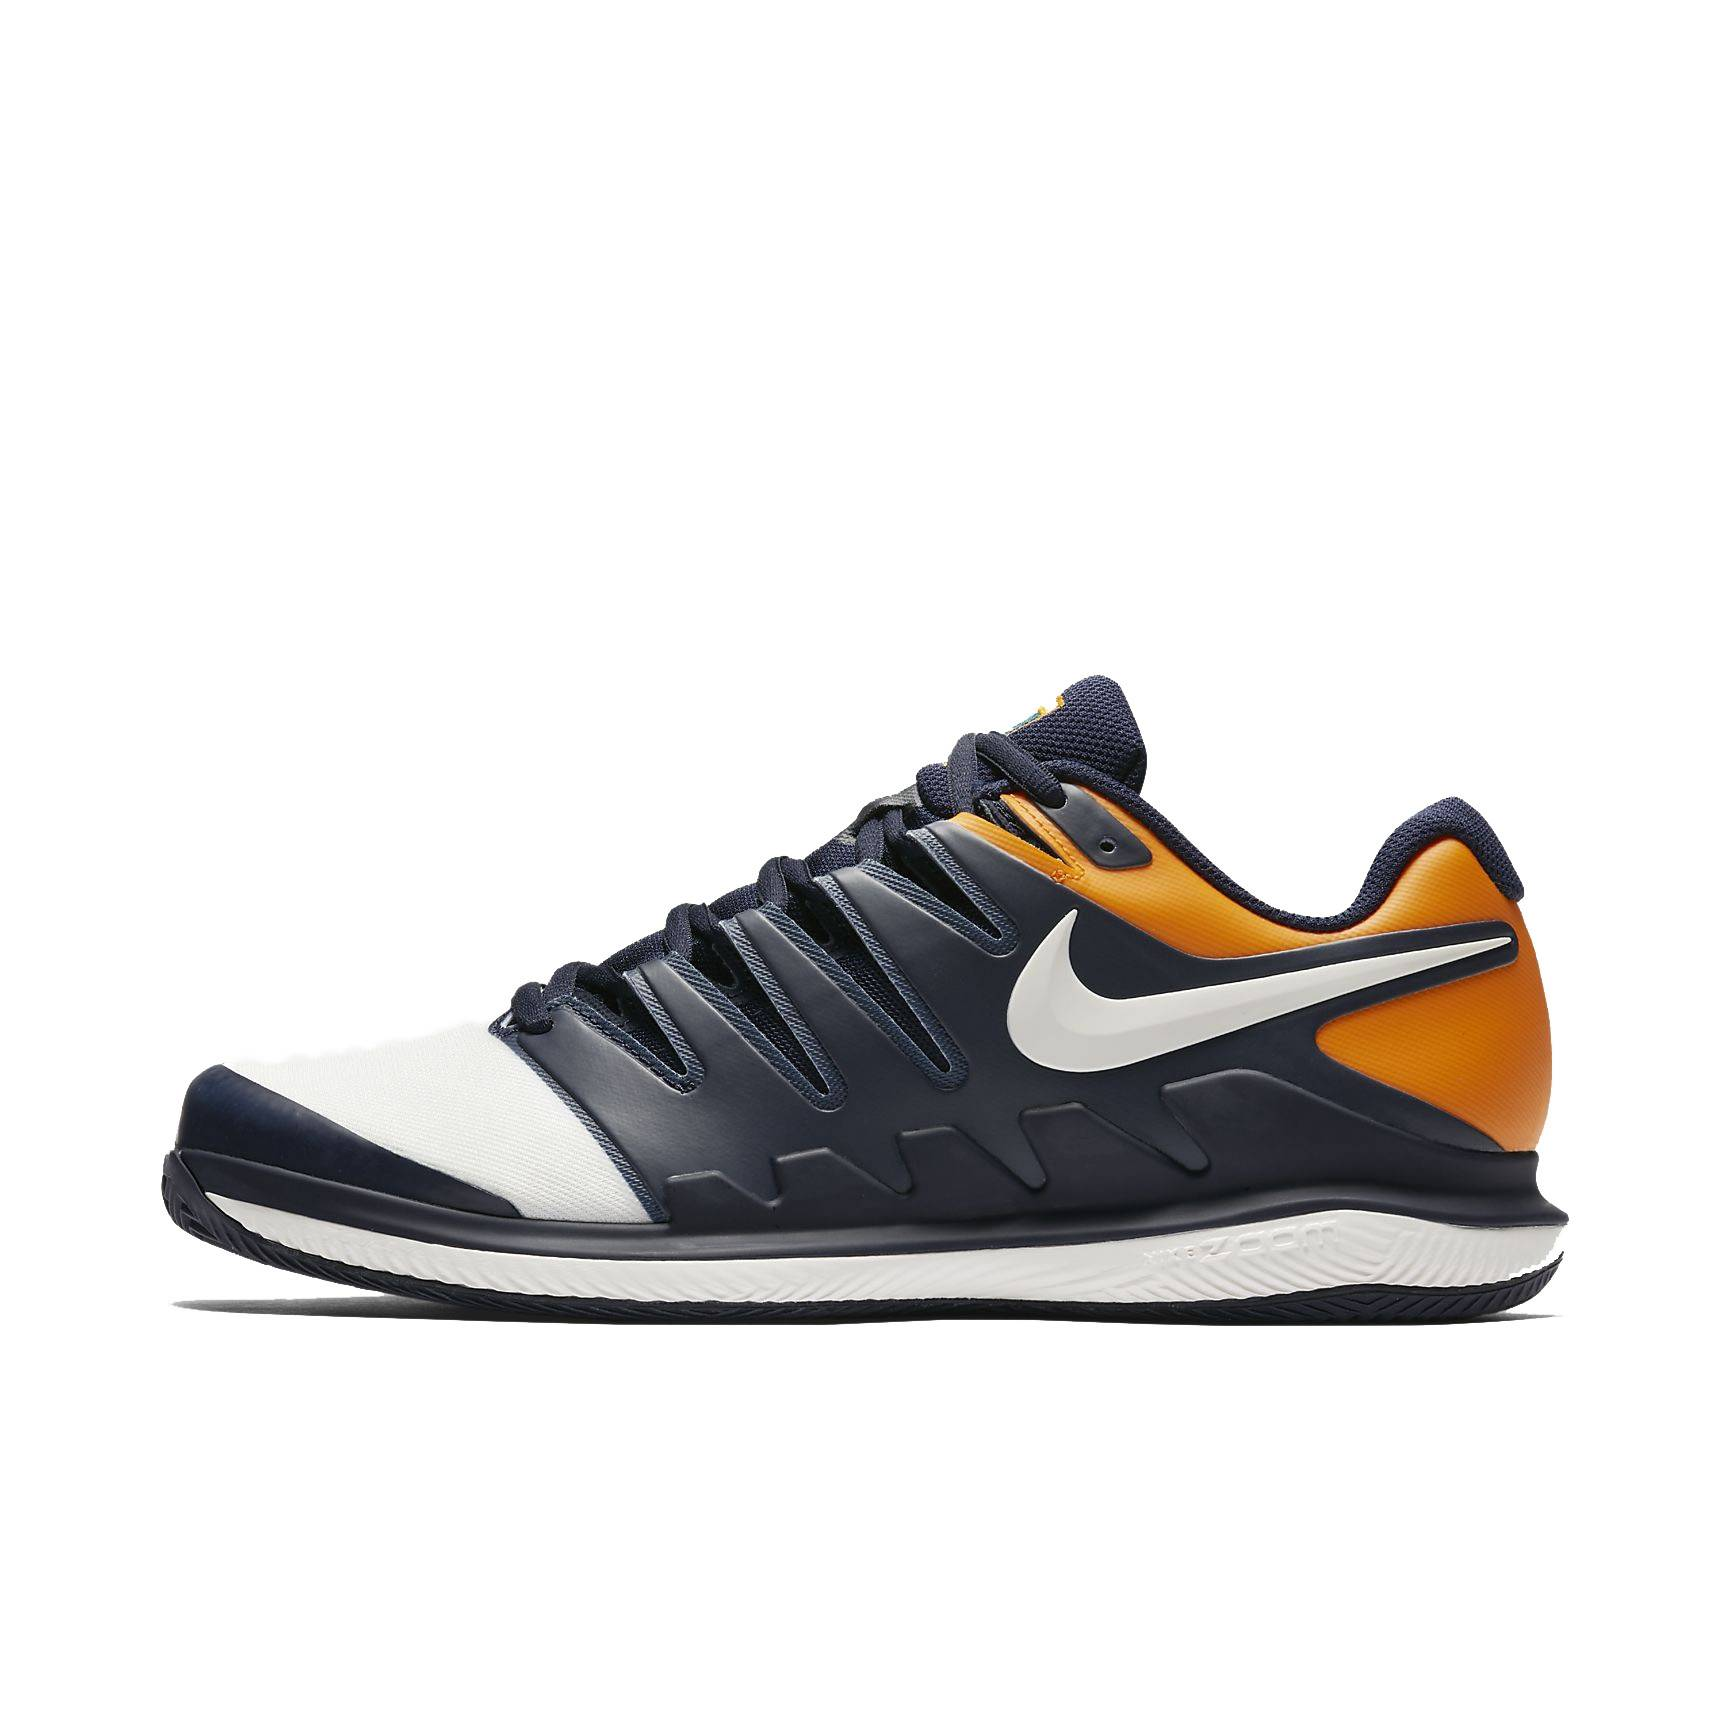 Image of Nike Air Zoom Vapor X Blue/Orange US Open 39